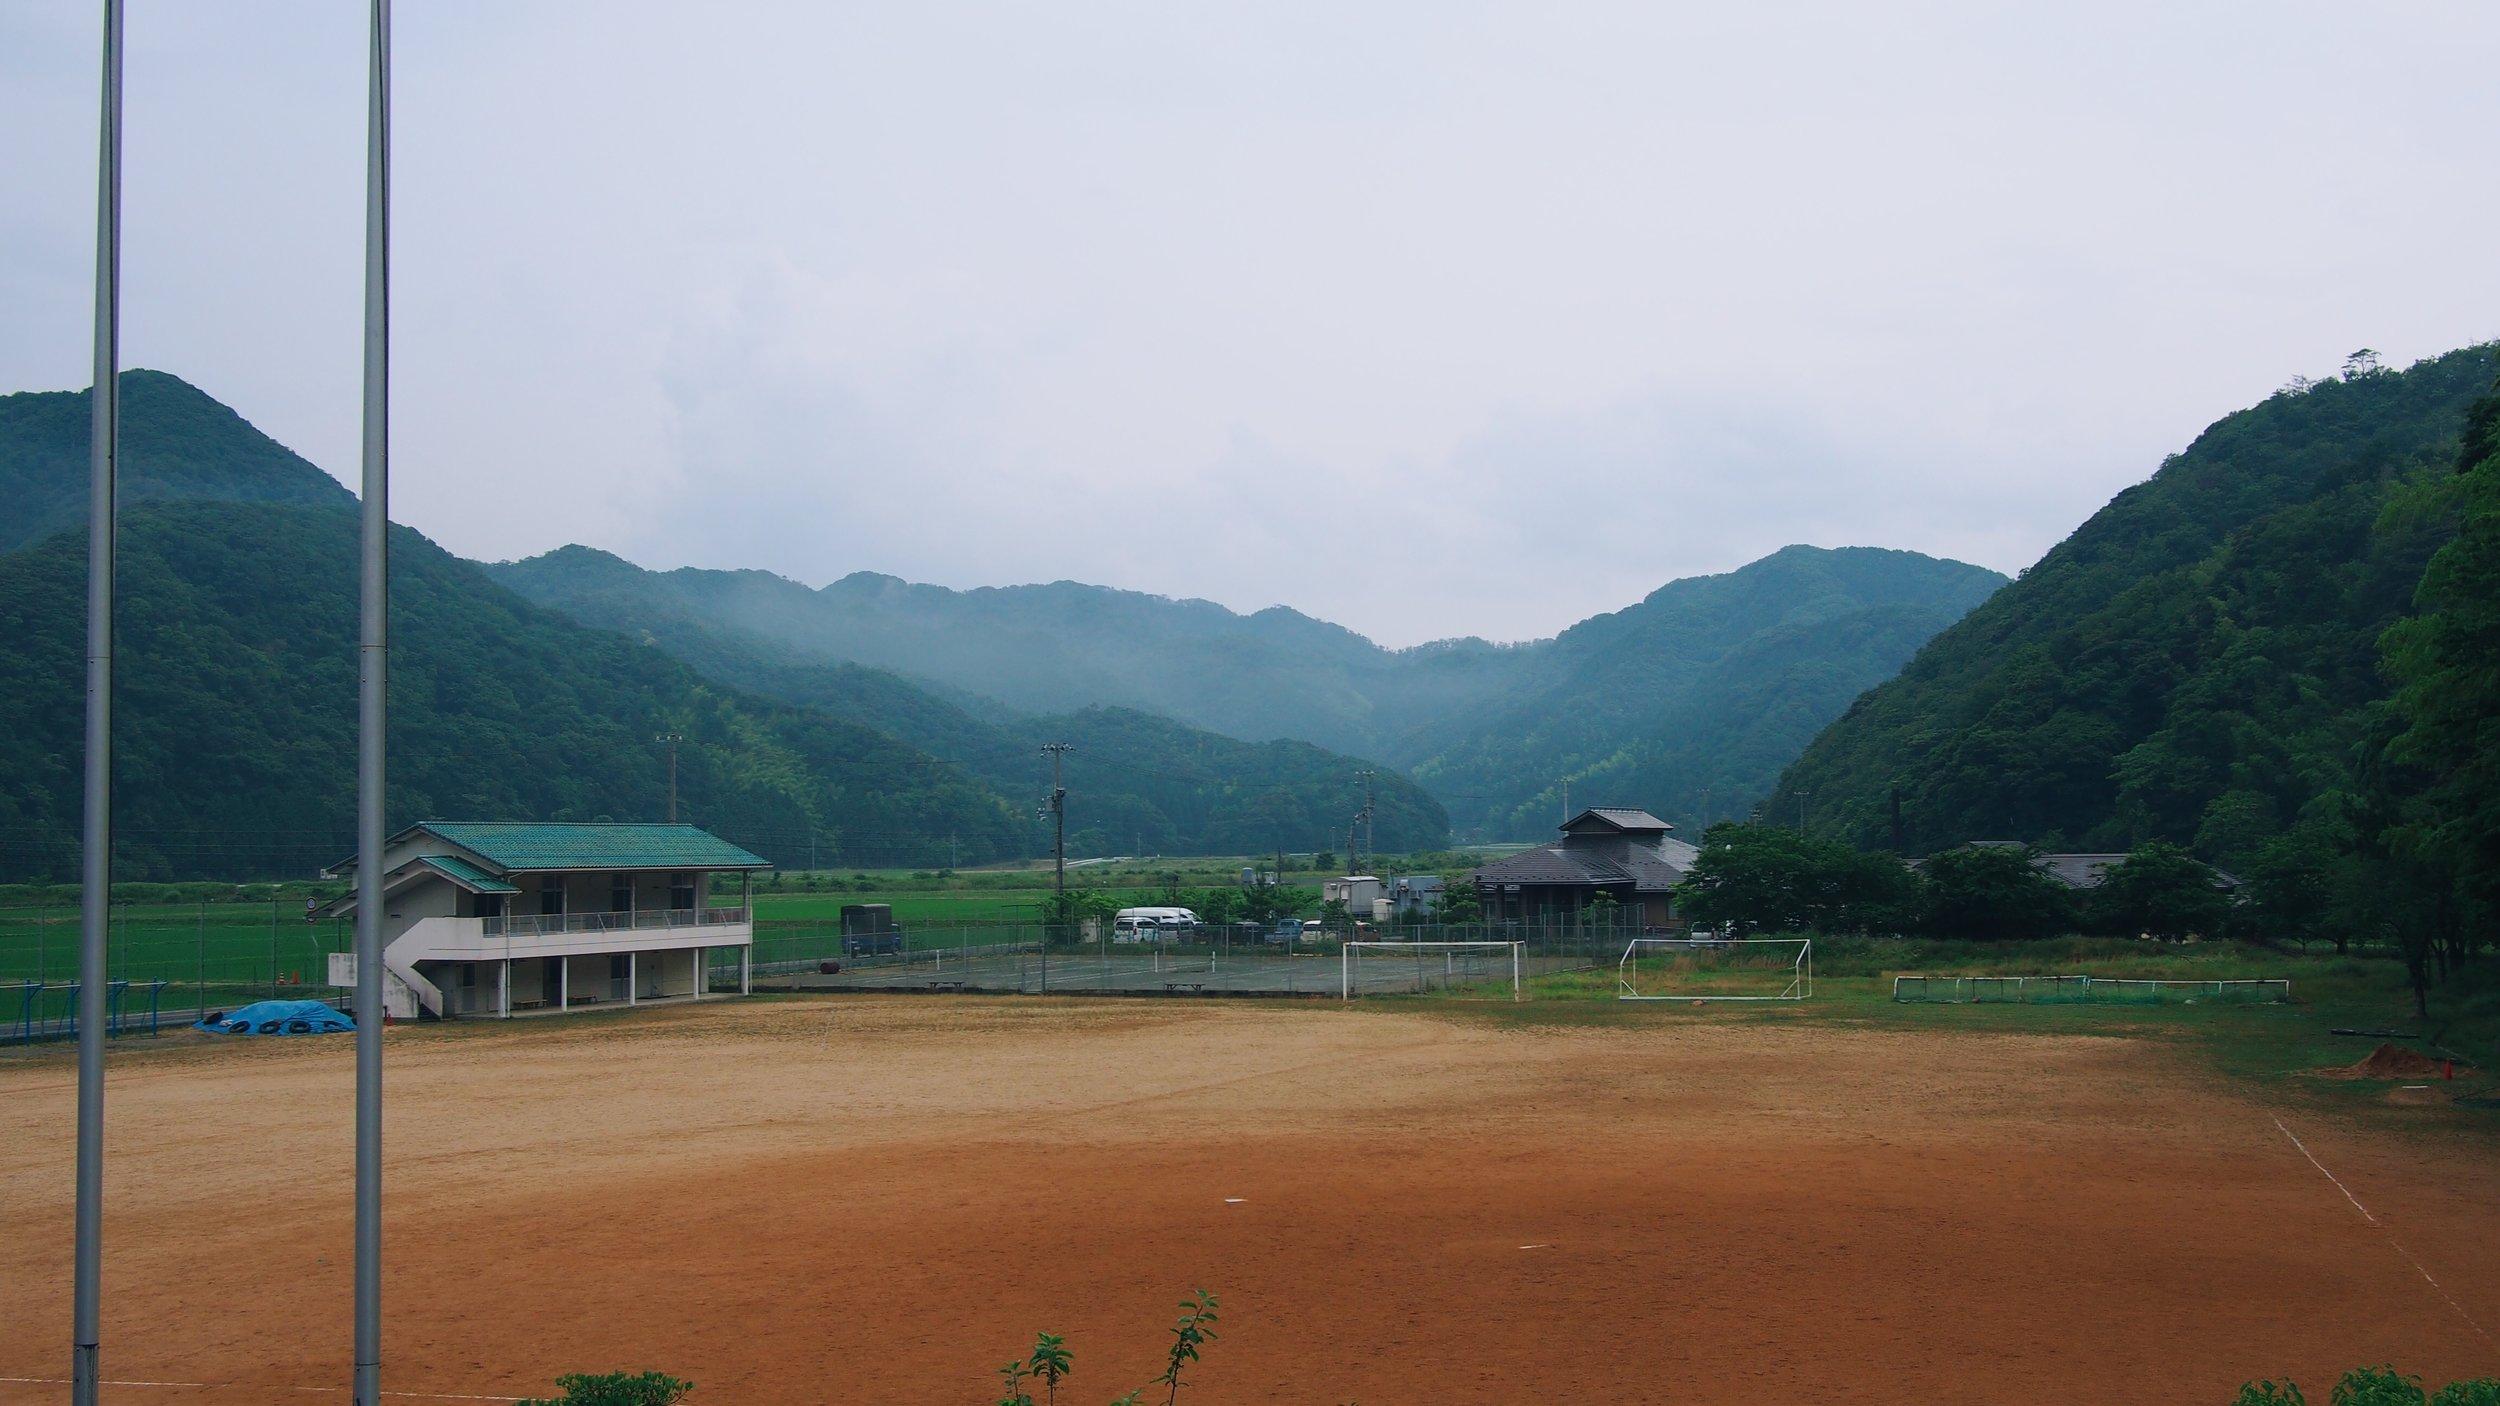 Japanese school yeard